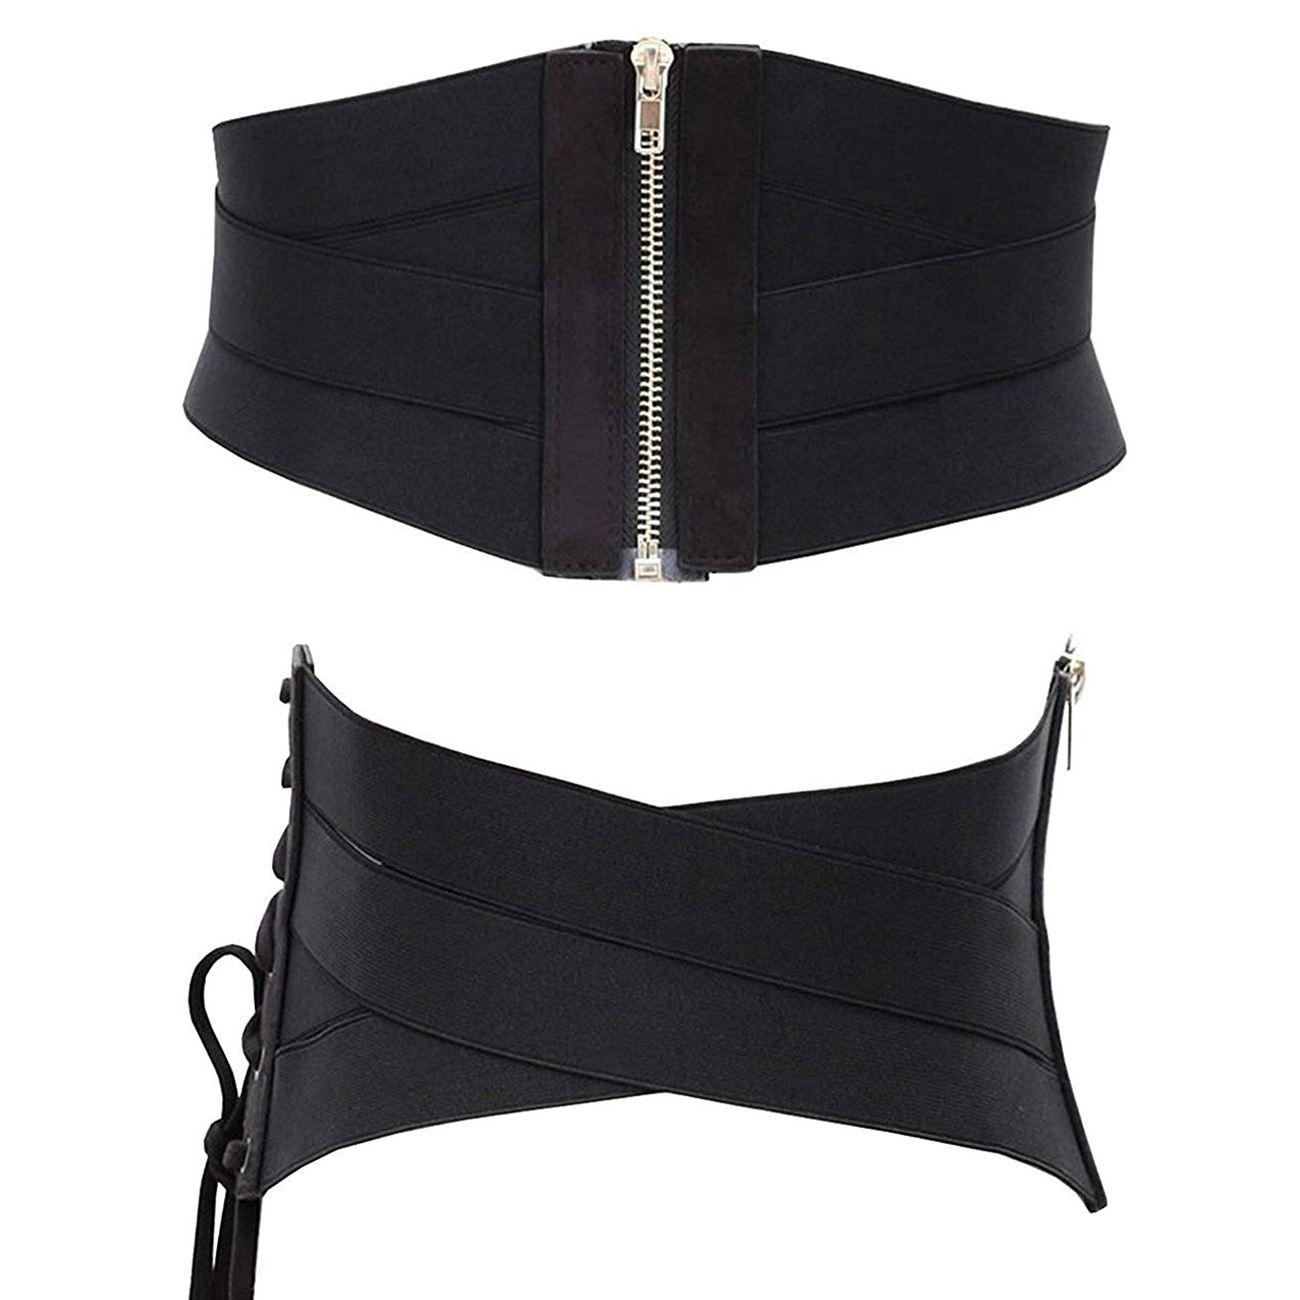 Women's Fashion Elastic Stretch Wide Band Corset Waist Belt